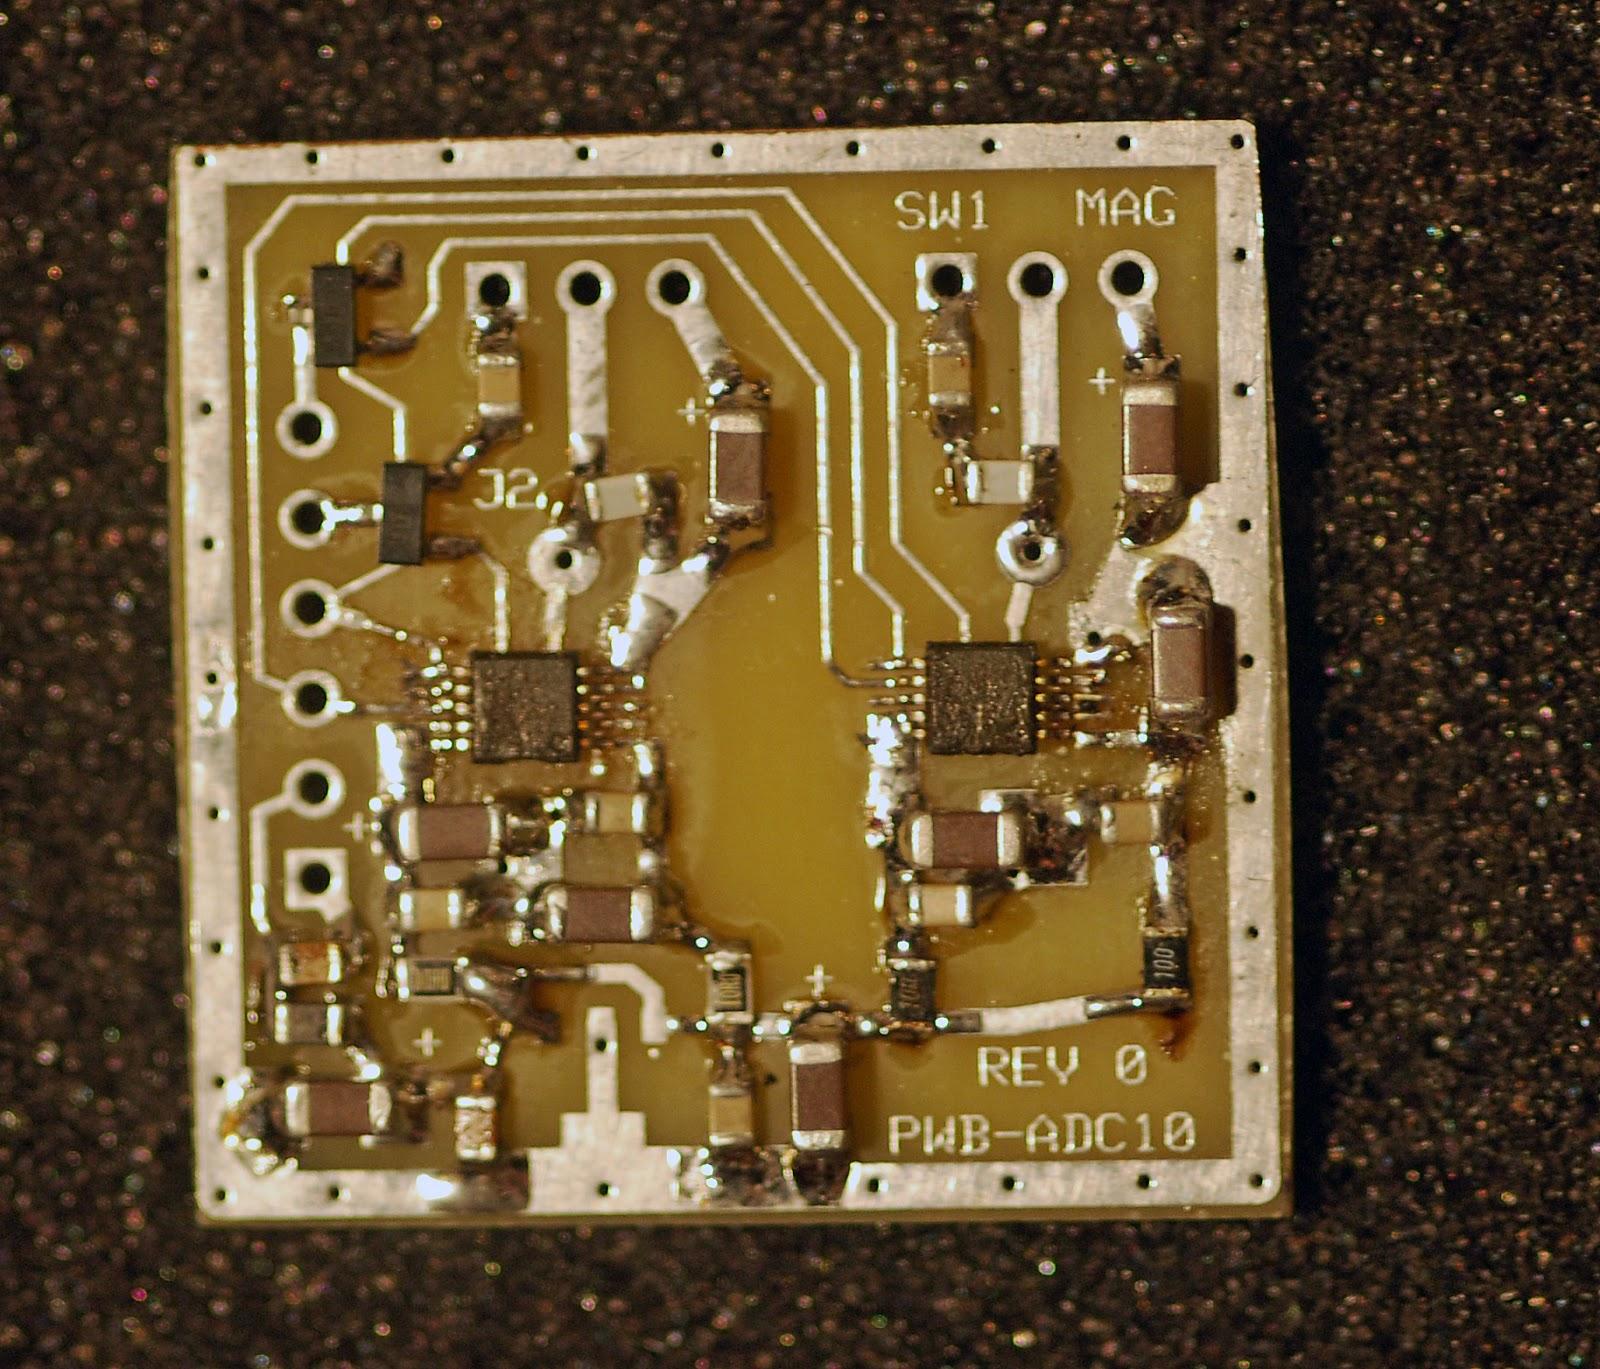 Rubi's World of embedded Electronics: Spectrum analyzer Part III ADC 16